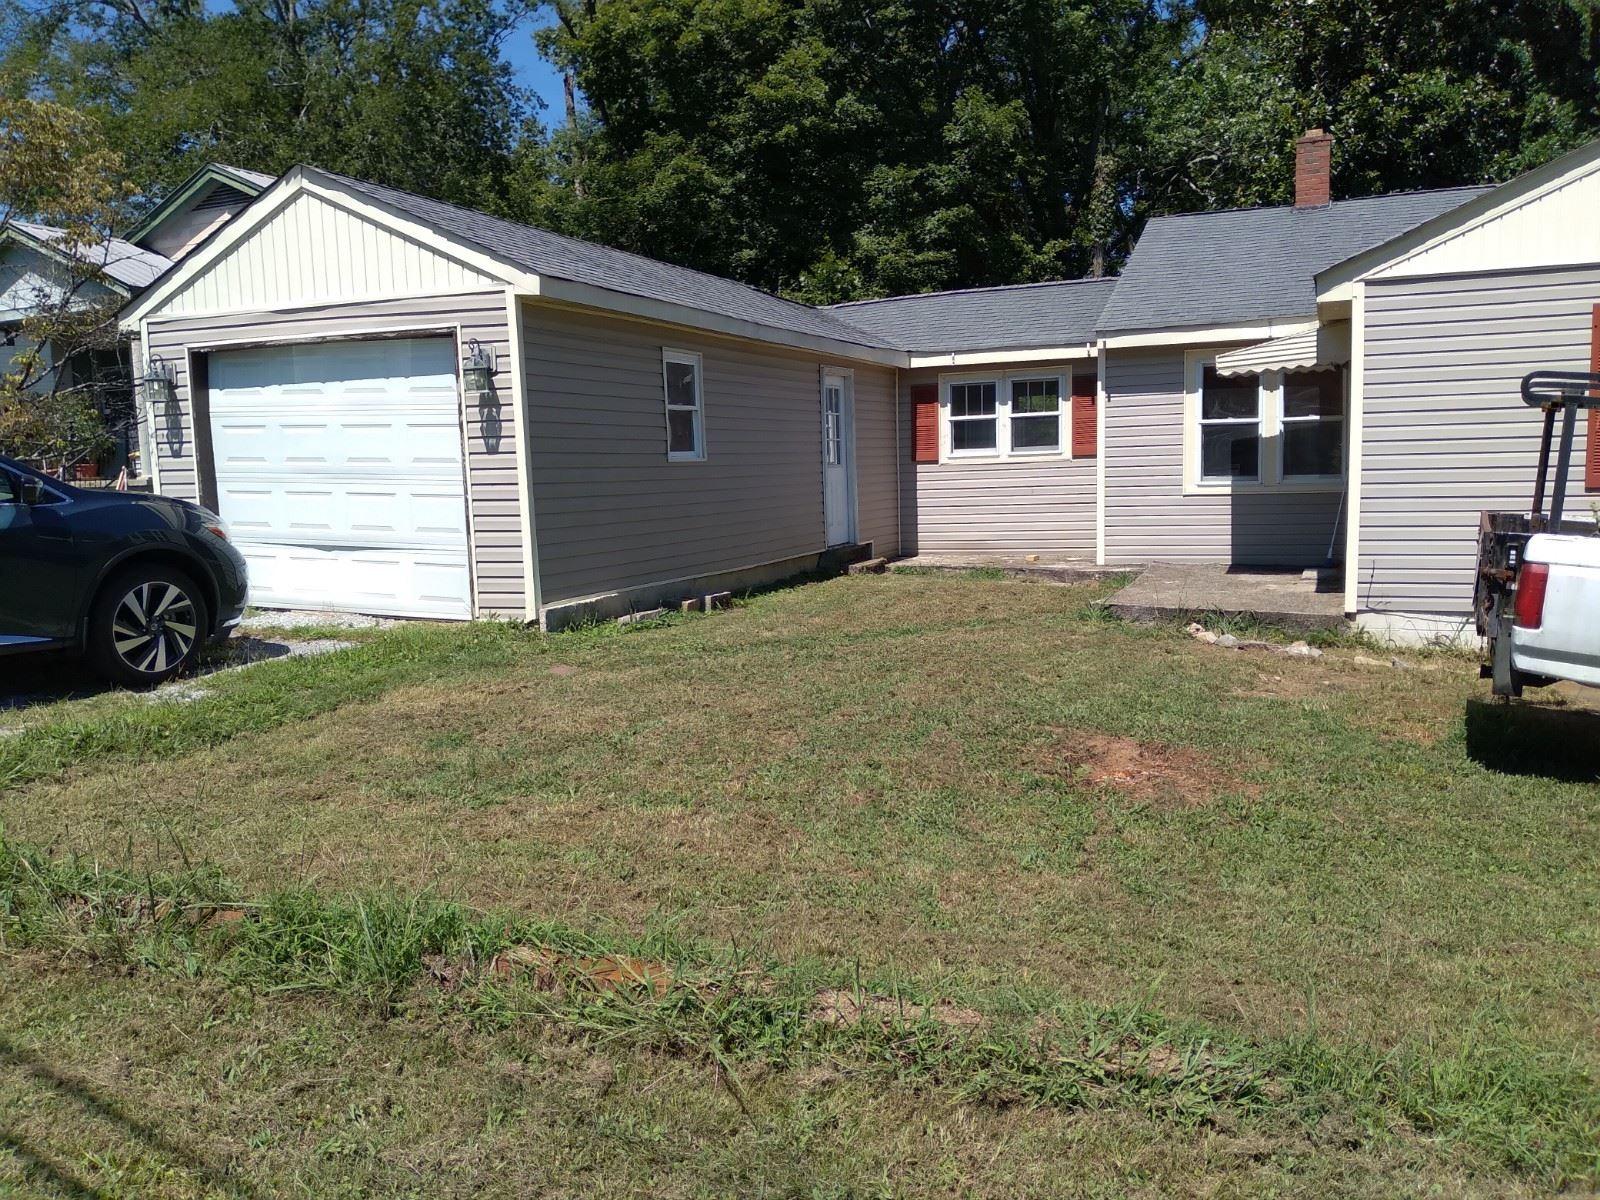 113 Riverside Dr, Centerville, TN 37033 - MLS#: 2180121